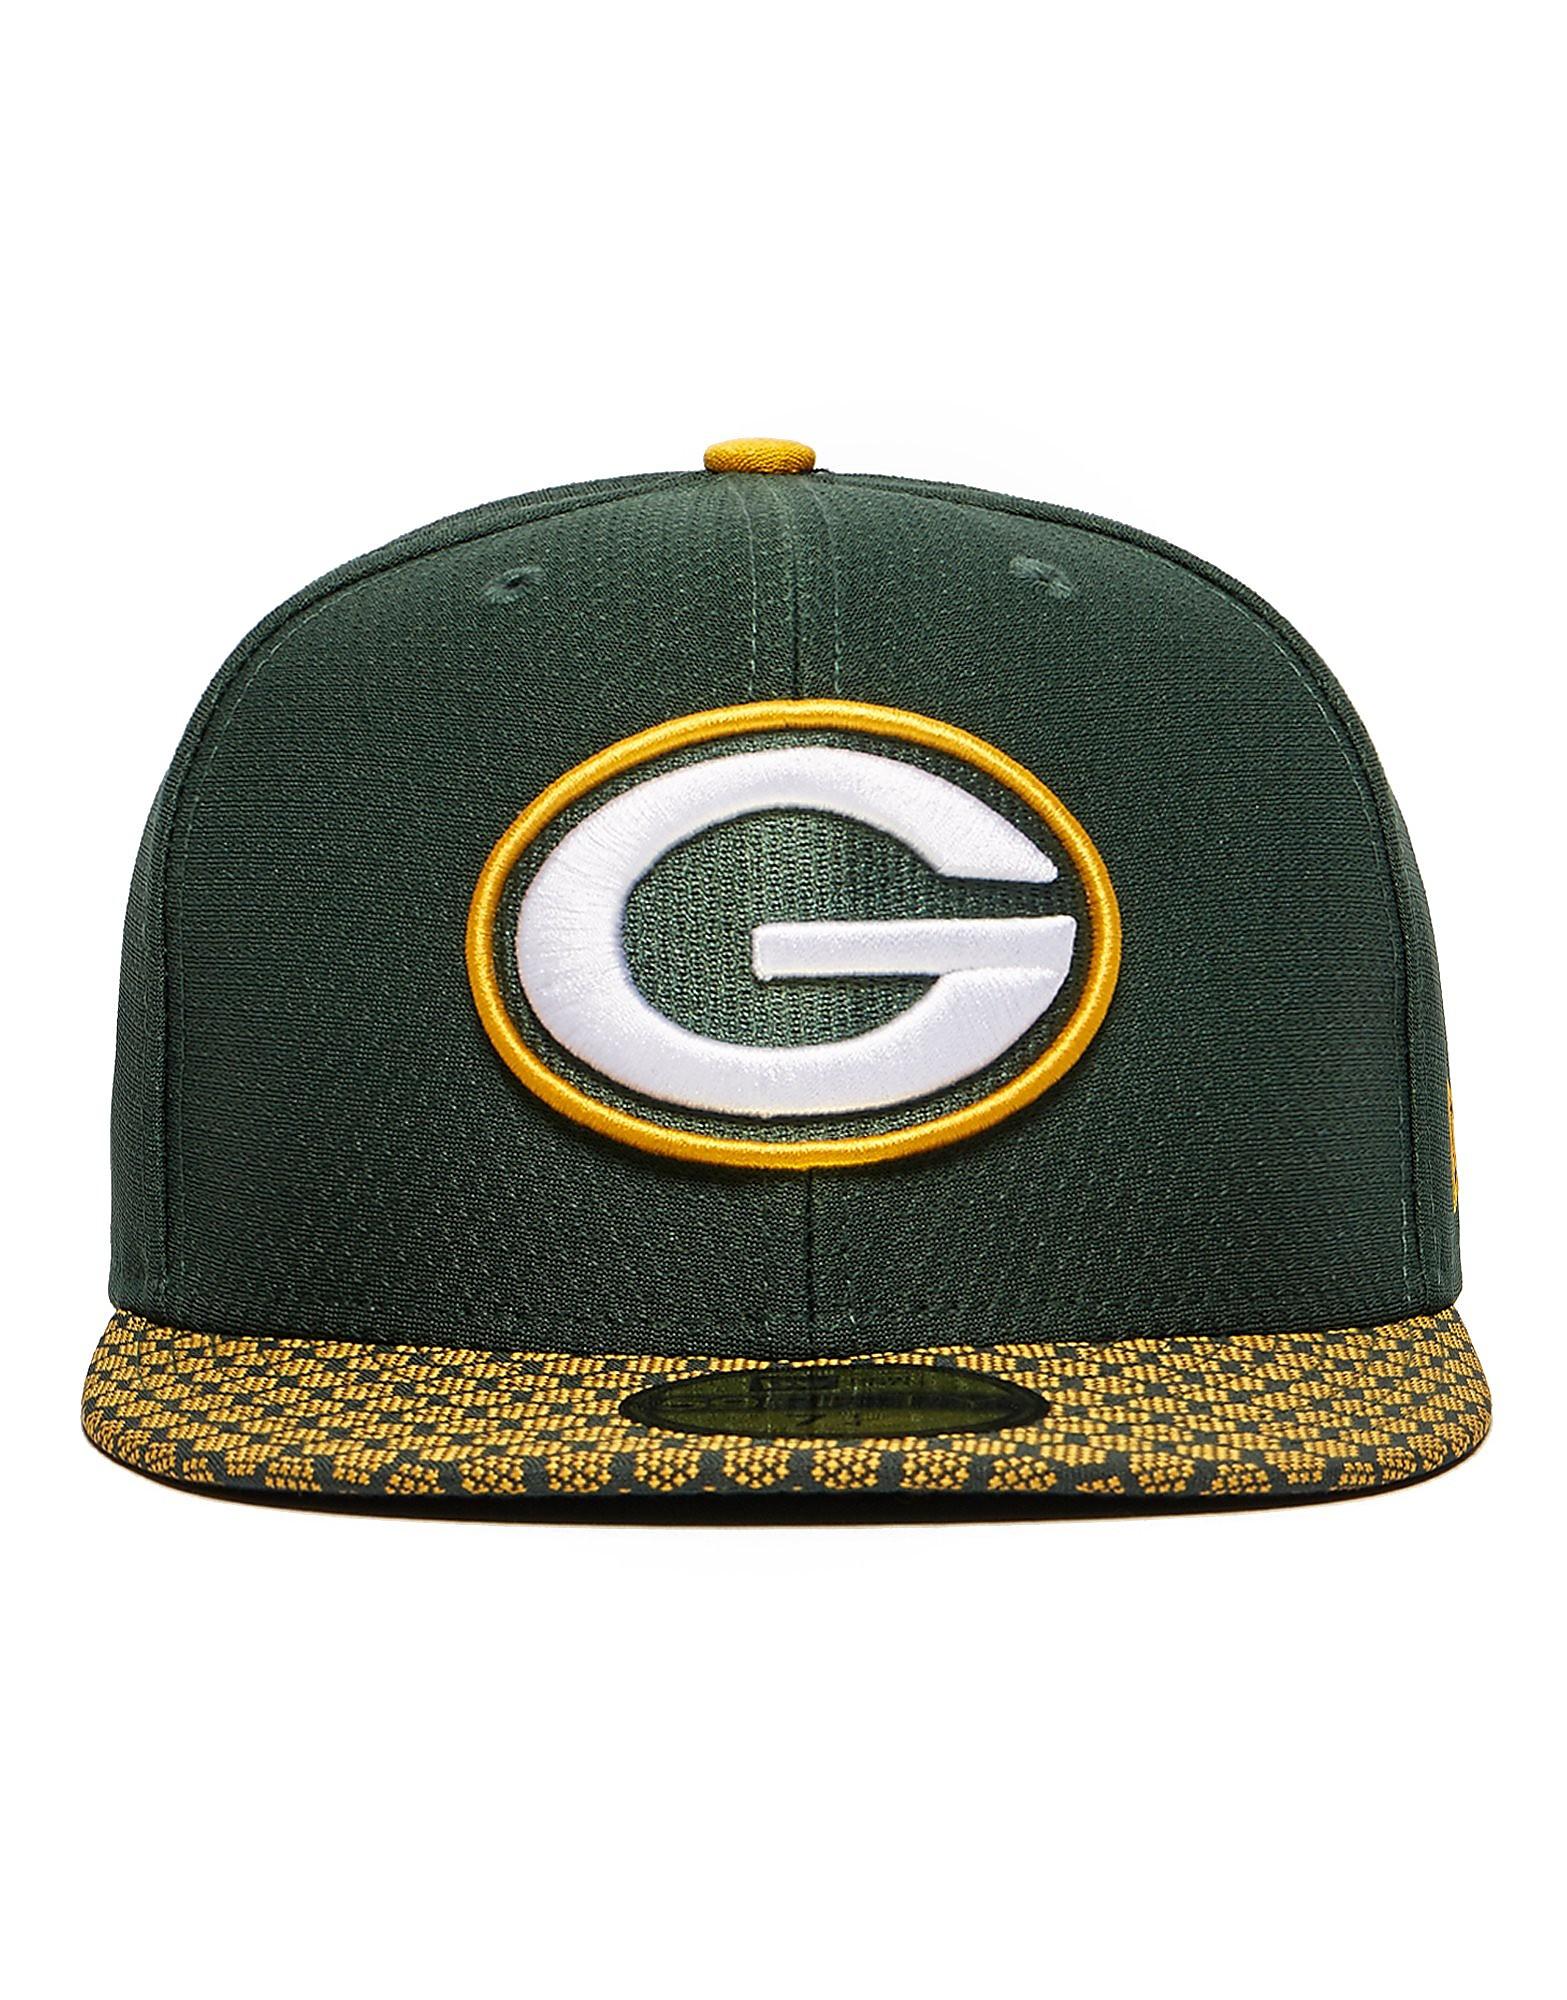 New Era NFL Green Bay Packers 59Fifty Cap